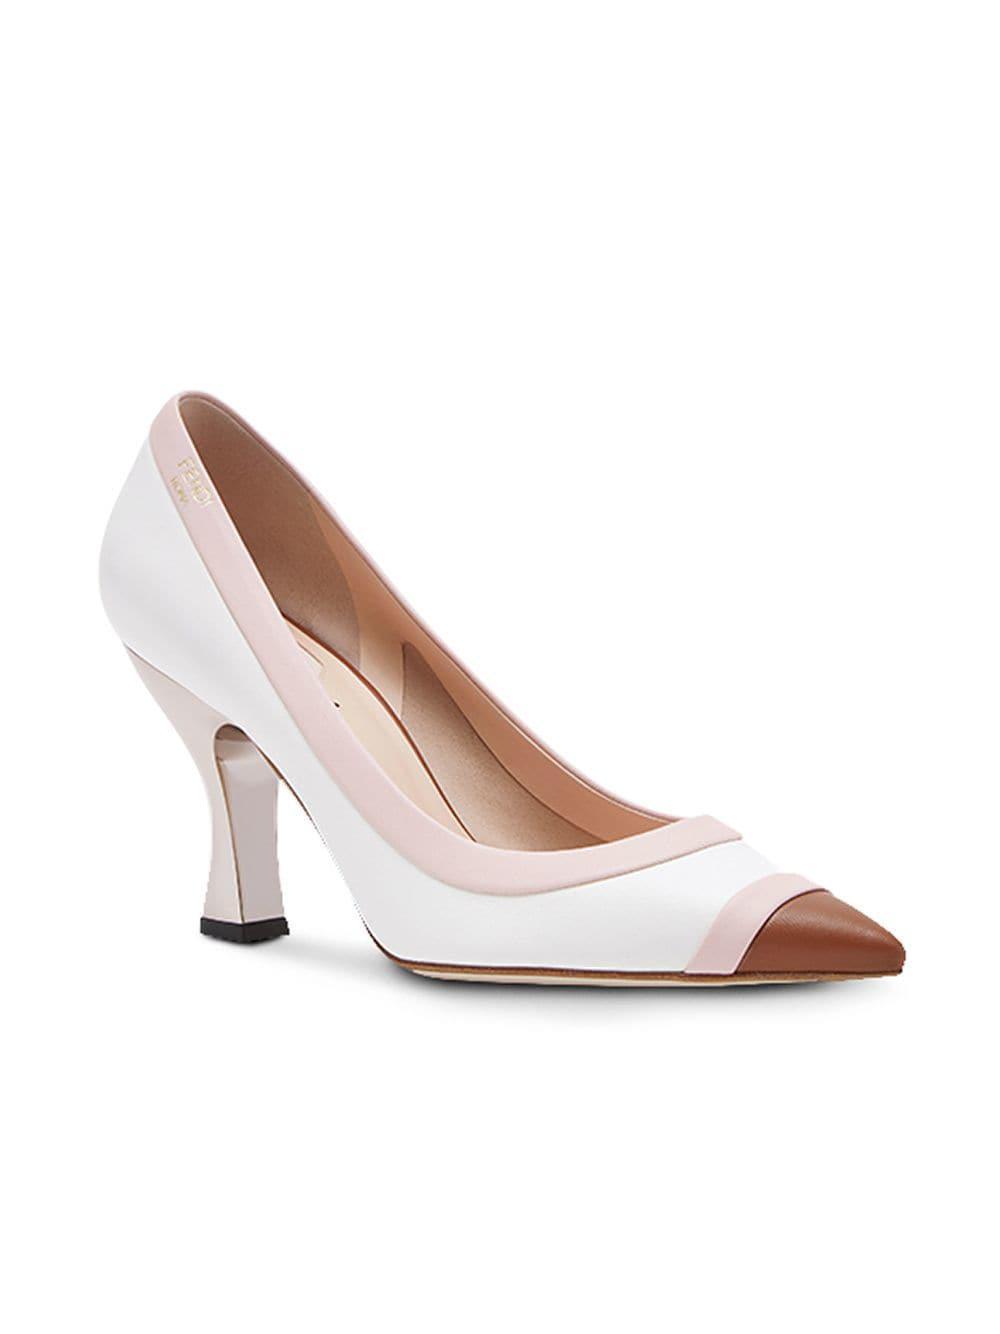 Fendi Slip-on Court Shoes in White - Lyst